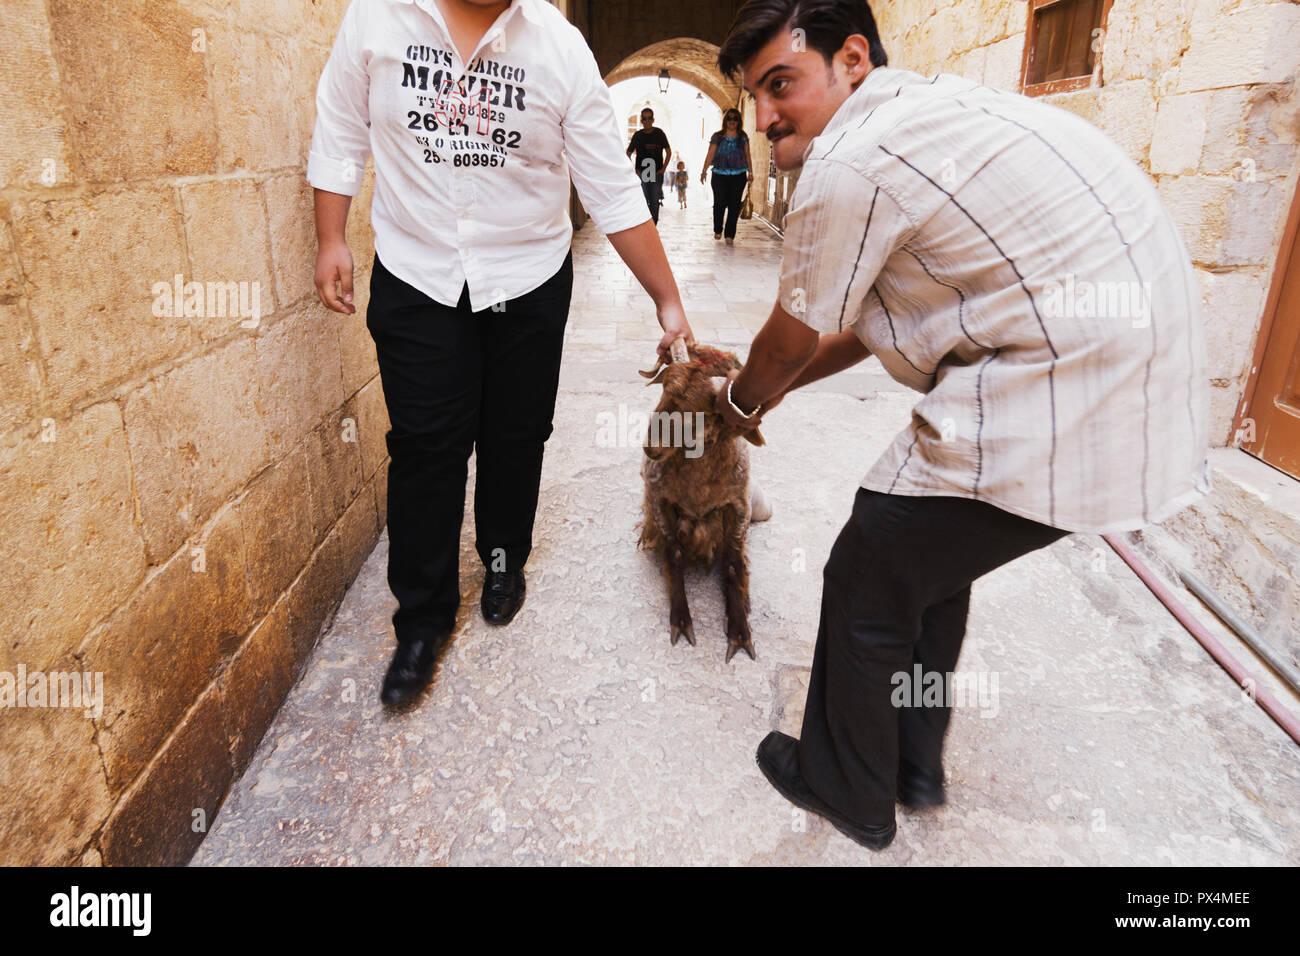 Damascus Goat Stock Photos & Damascus Goat Stock Images - Alamy